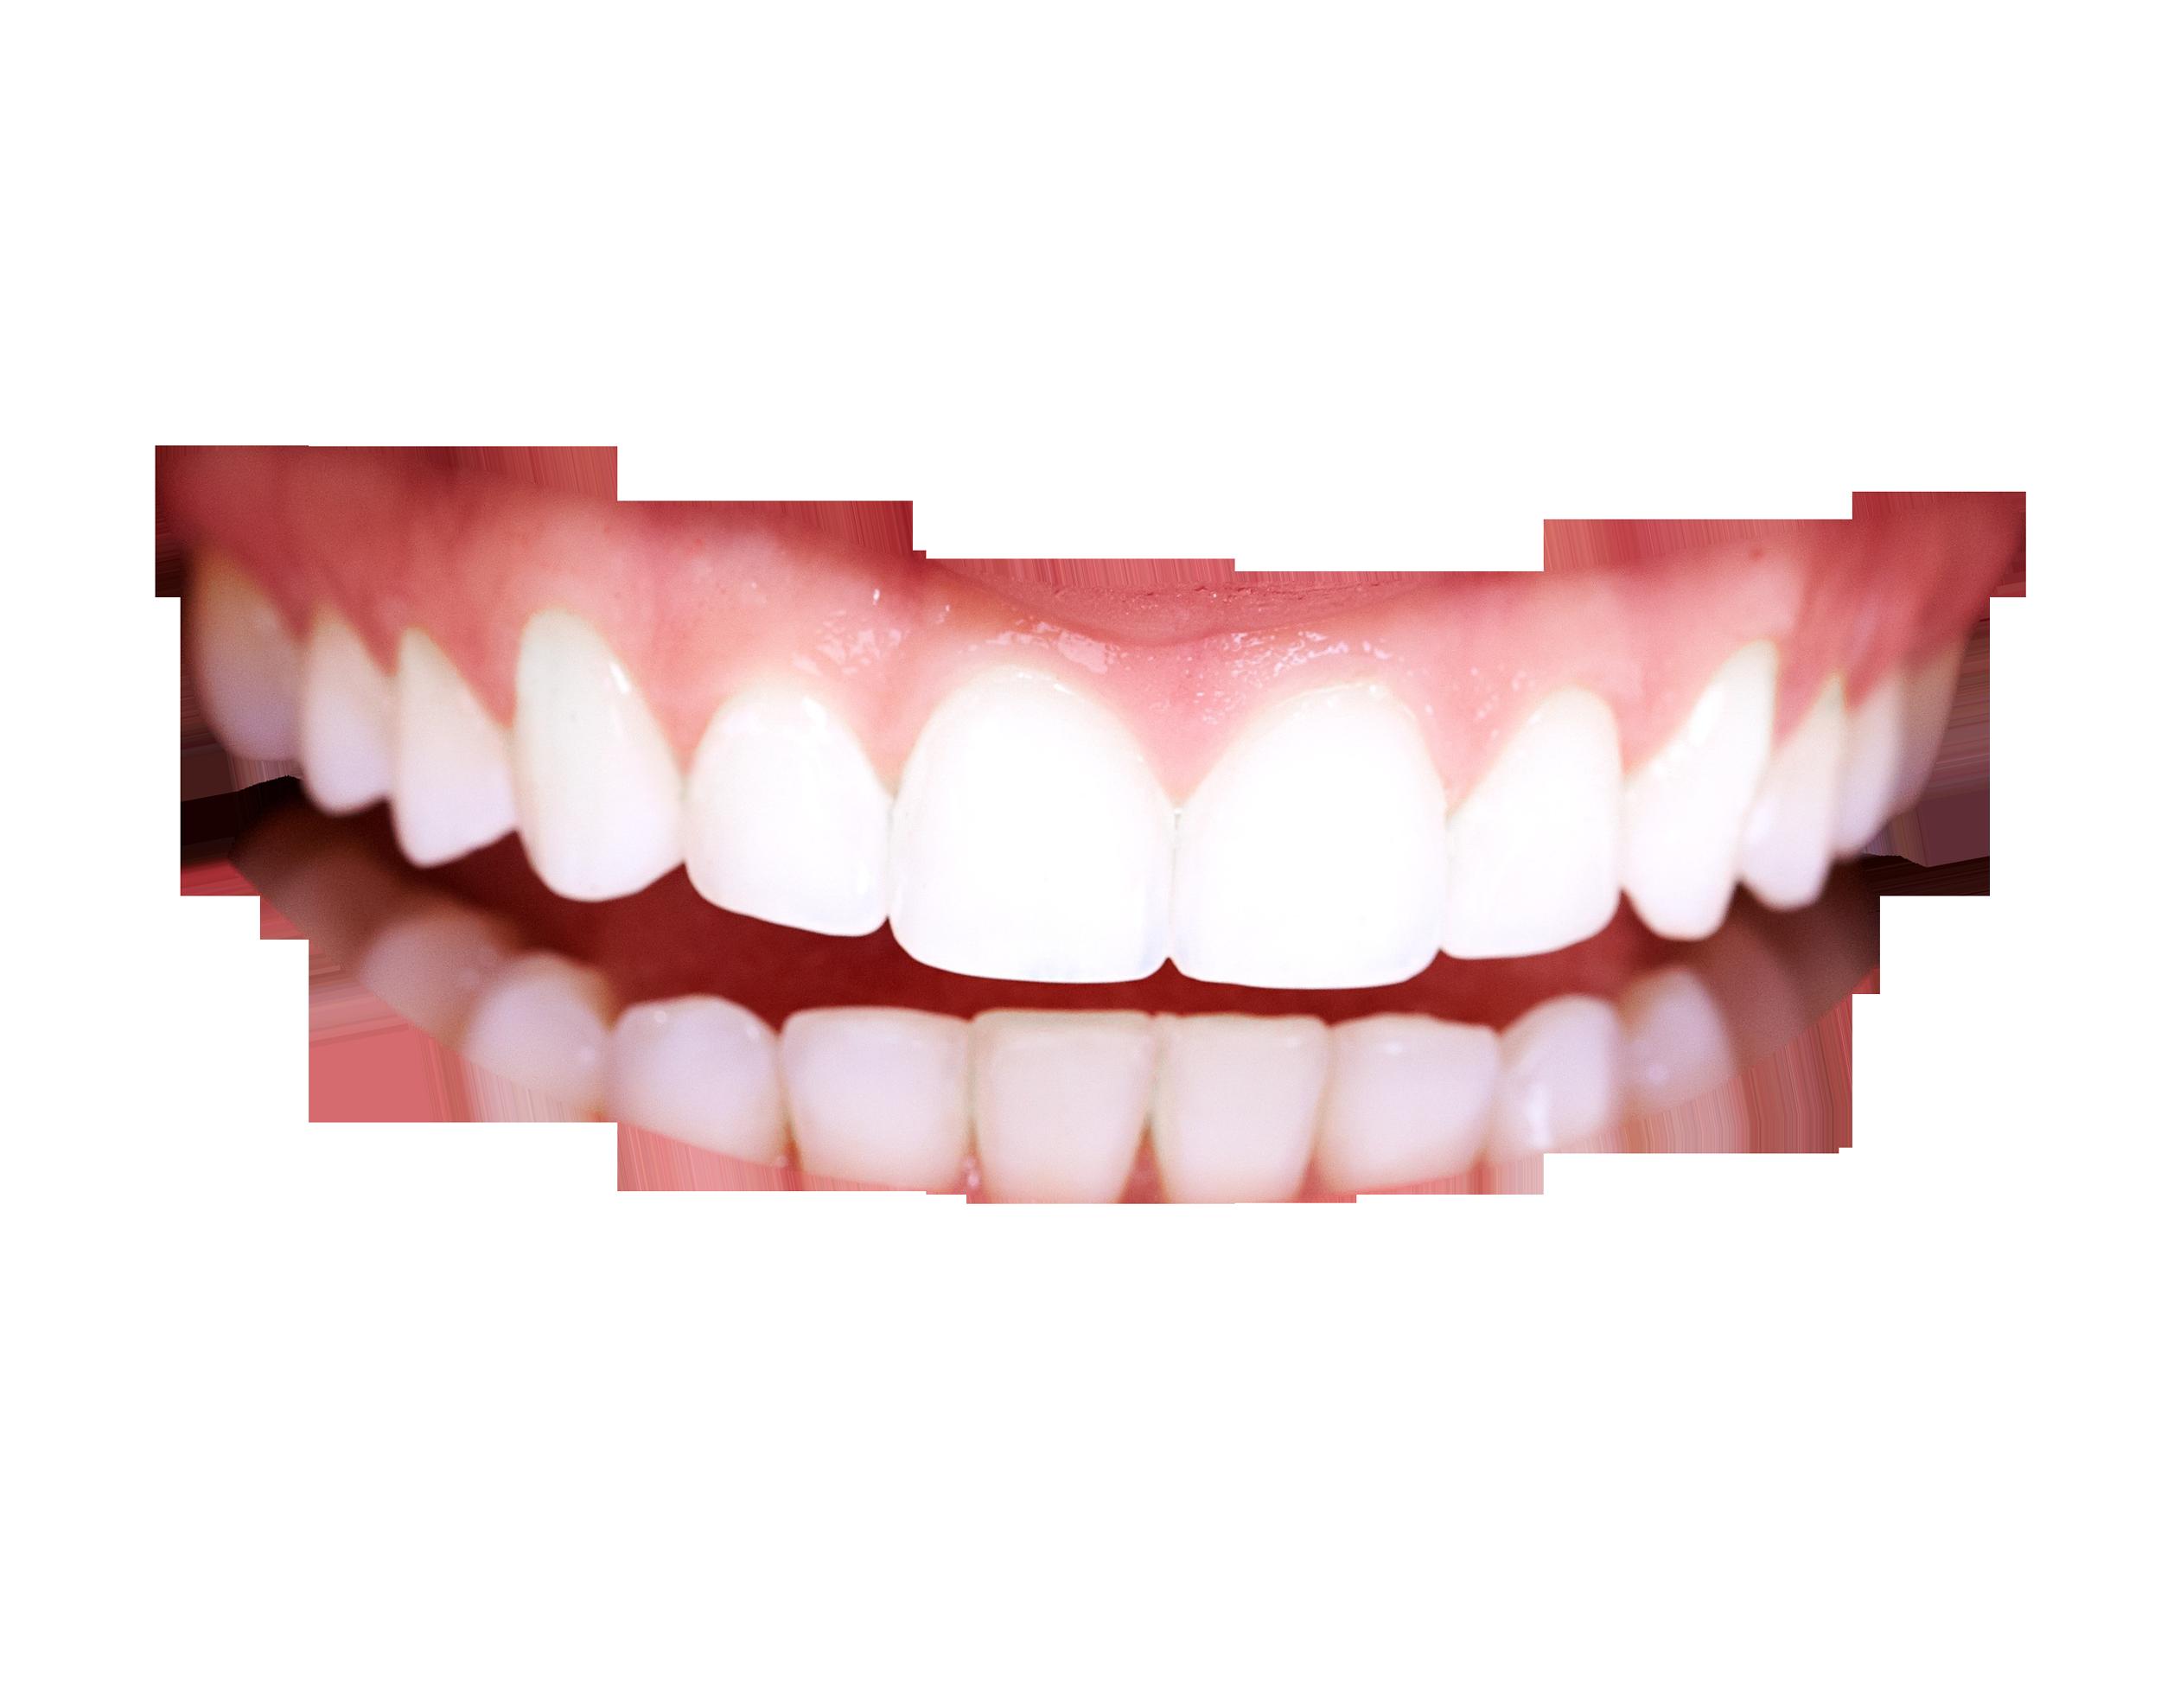 Teeth PNG-PlusPNG pluspng.com-2500 - Teeth PNG - Teeth Smile PNG HD